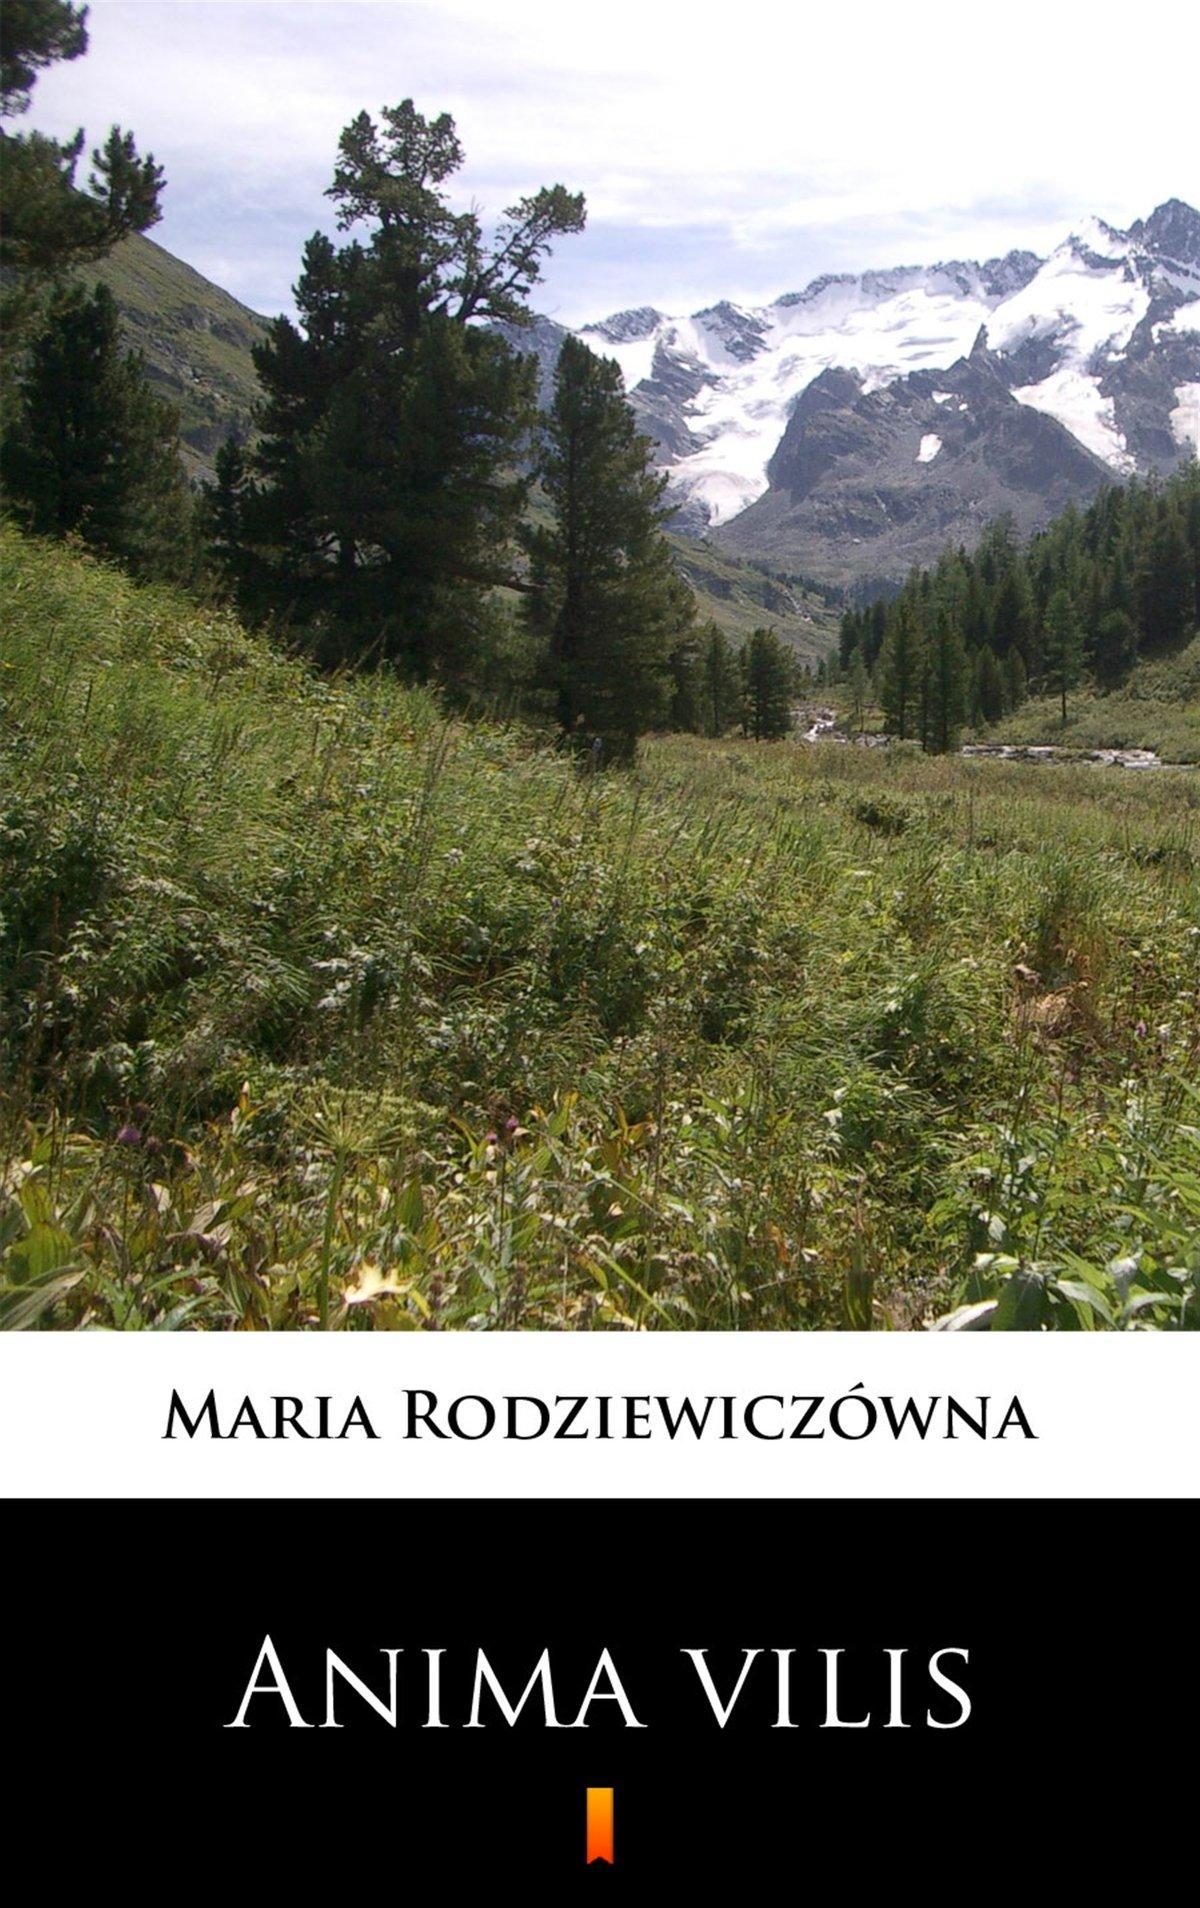 Anima vilis - Ebook (Książka na Kindle) do pobrania w formacie MOBI